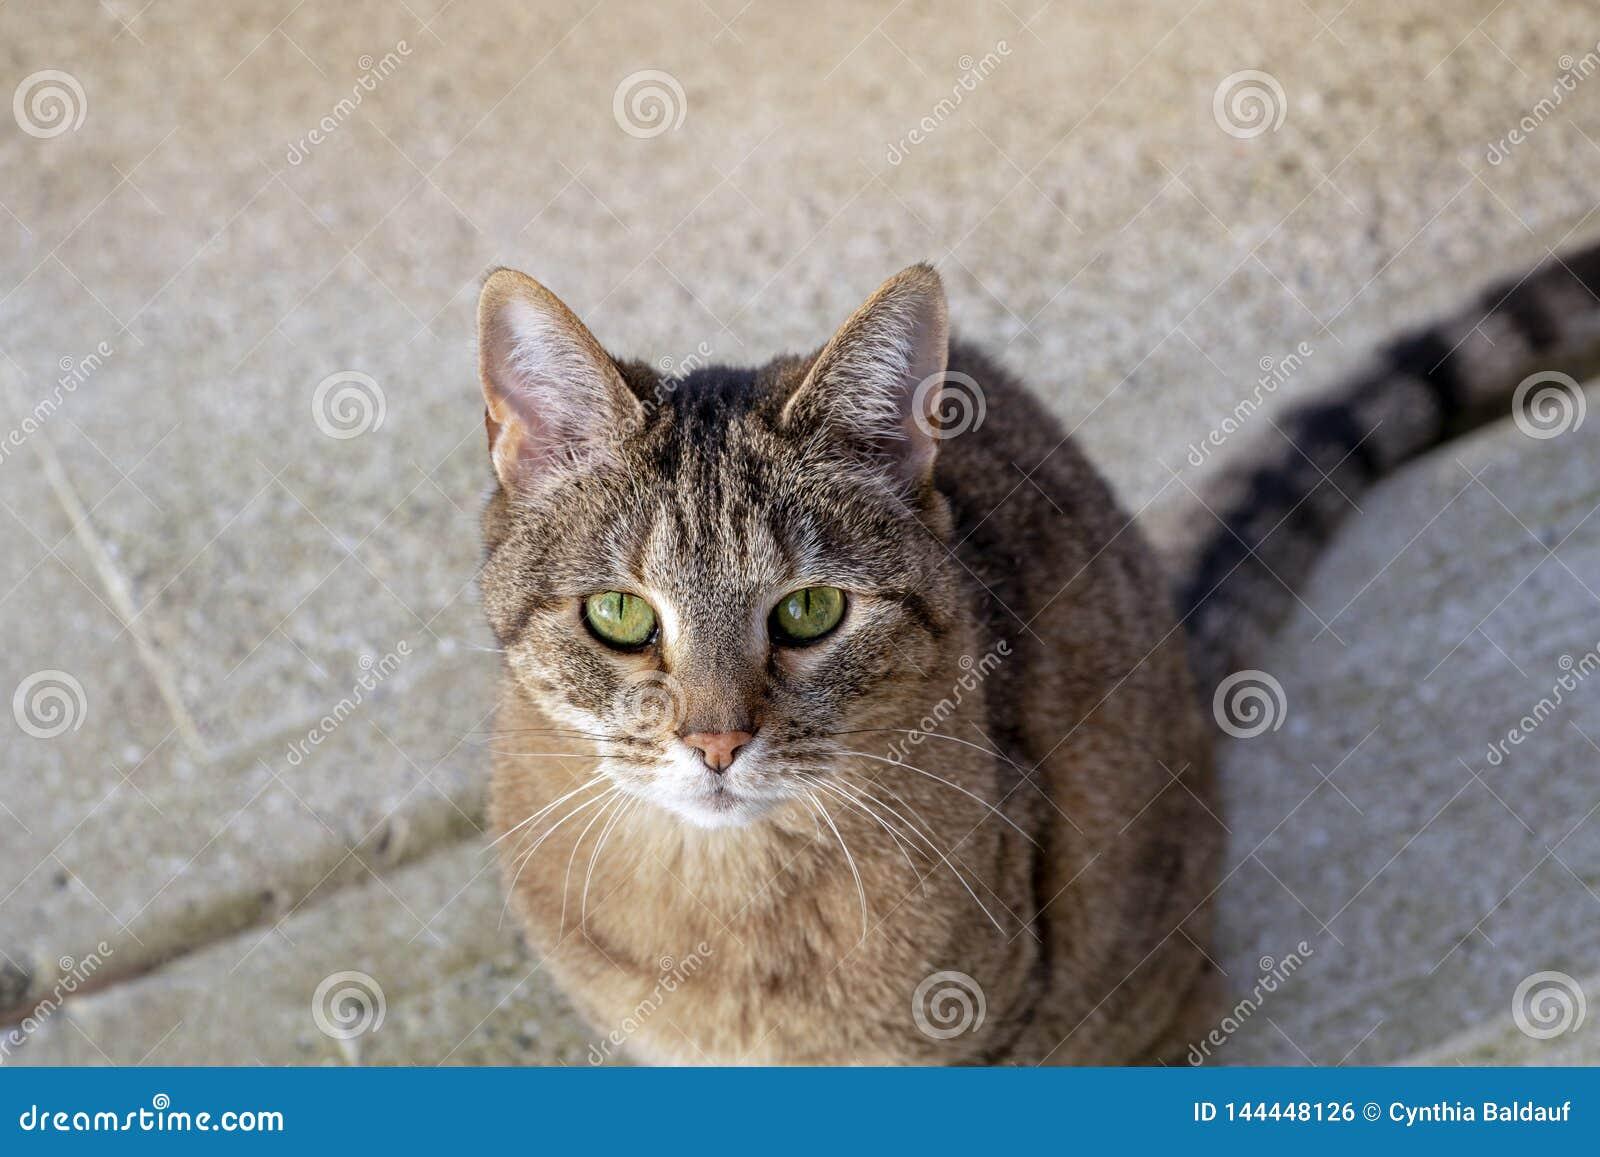 Tabby Cat Looking Up en la cámara